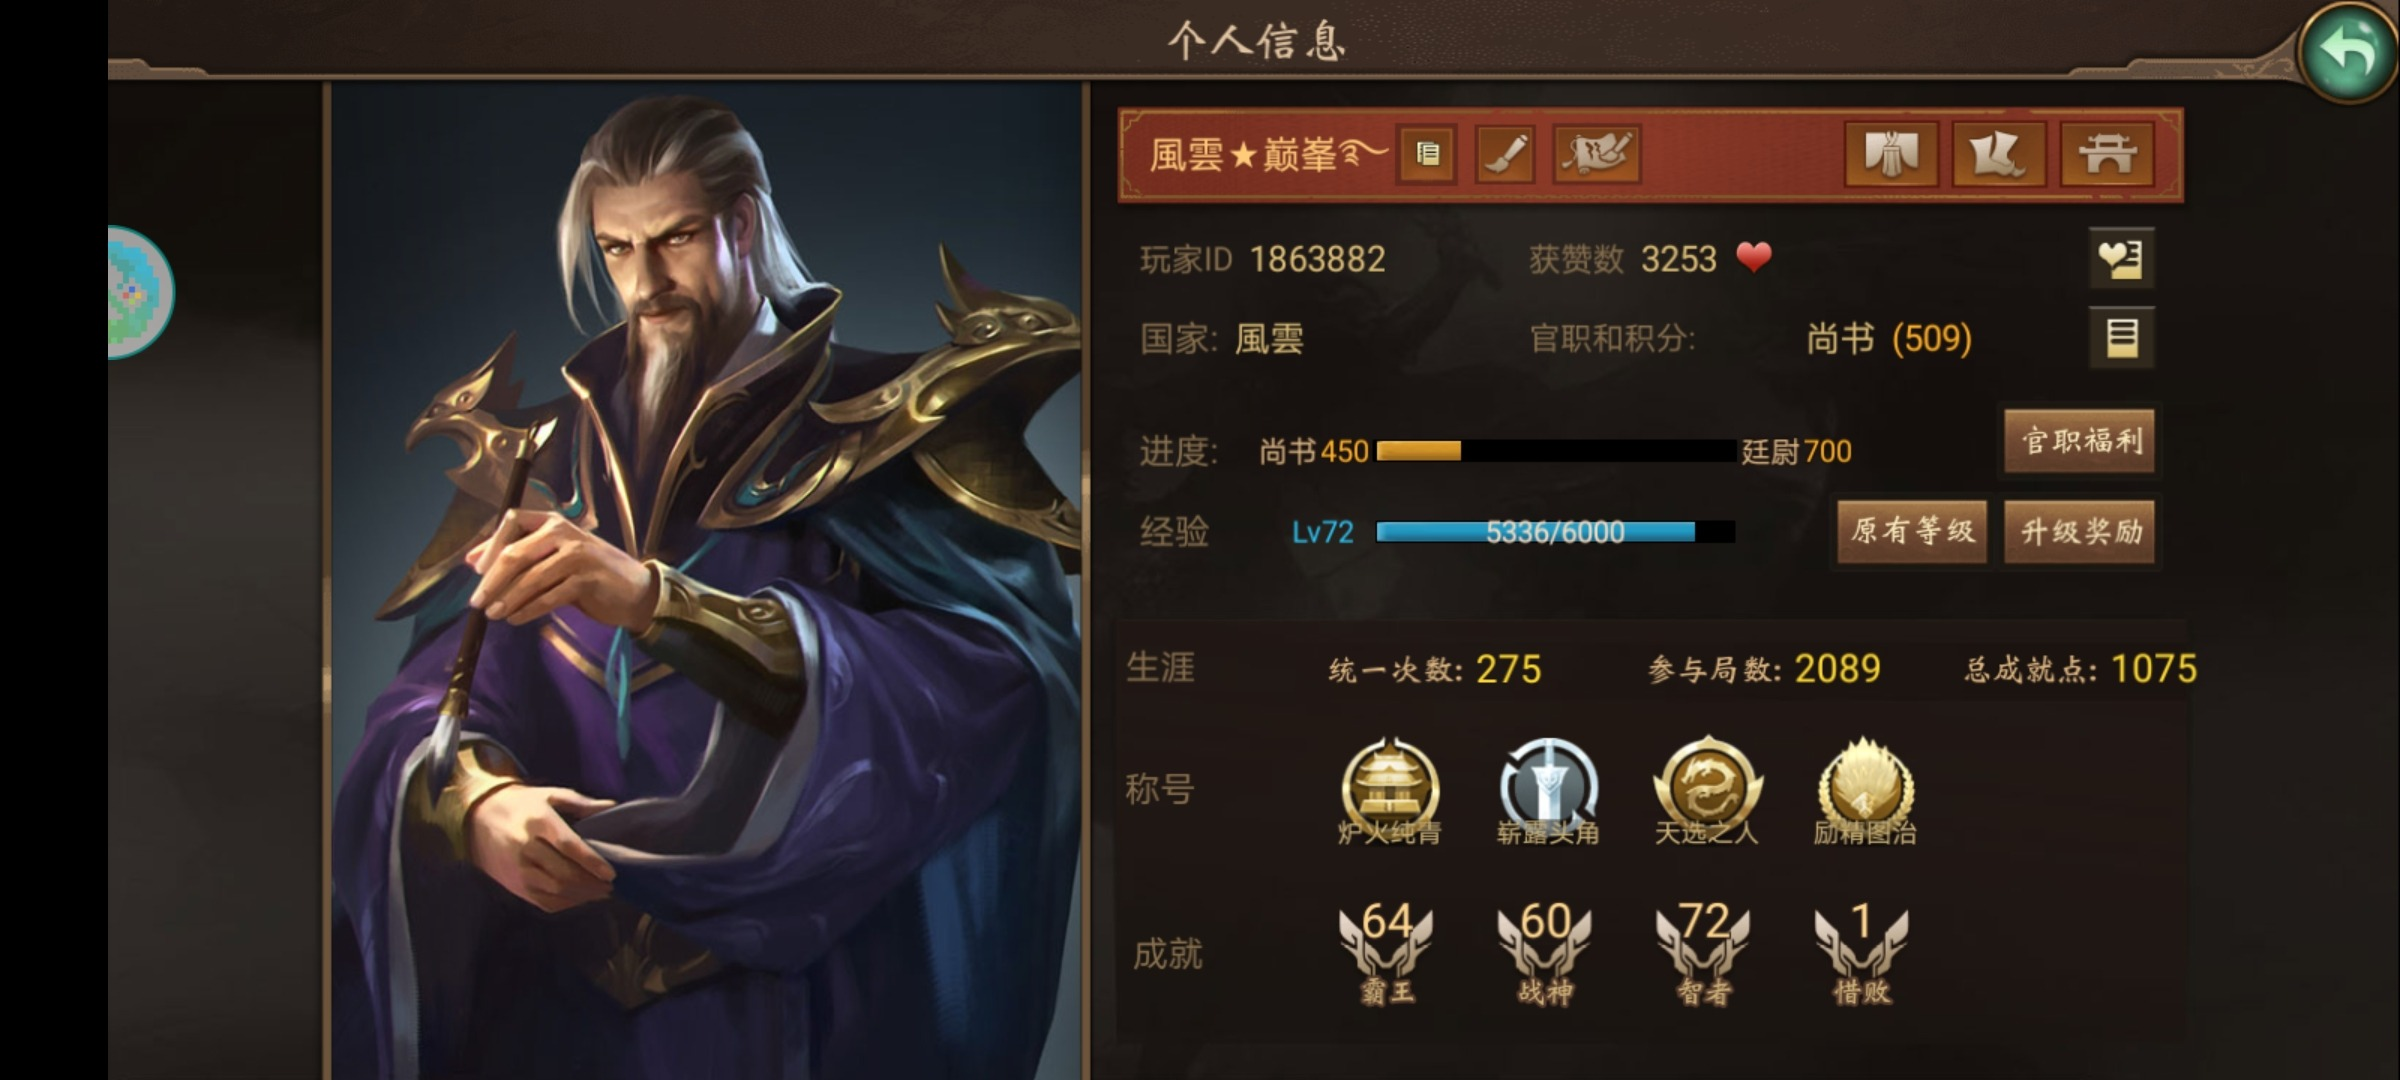 Screenshot_20210602_181633_com.tencent.tmgp.zdjs.caohua.jpg